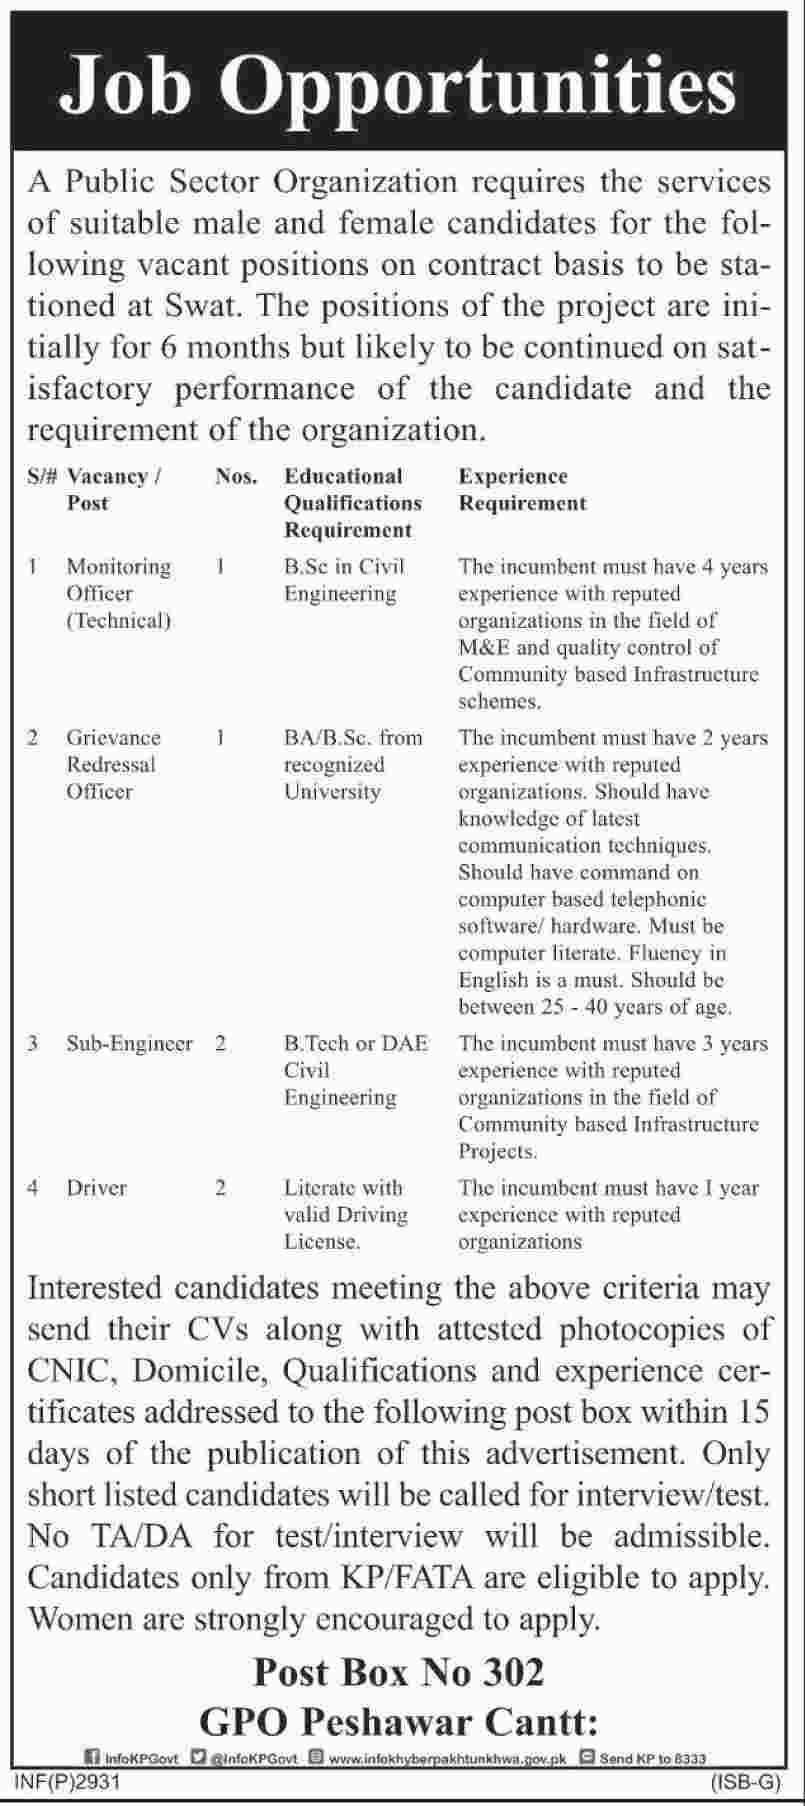 PO Box 302 GPO Cantt Peshawar Jobs